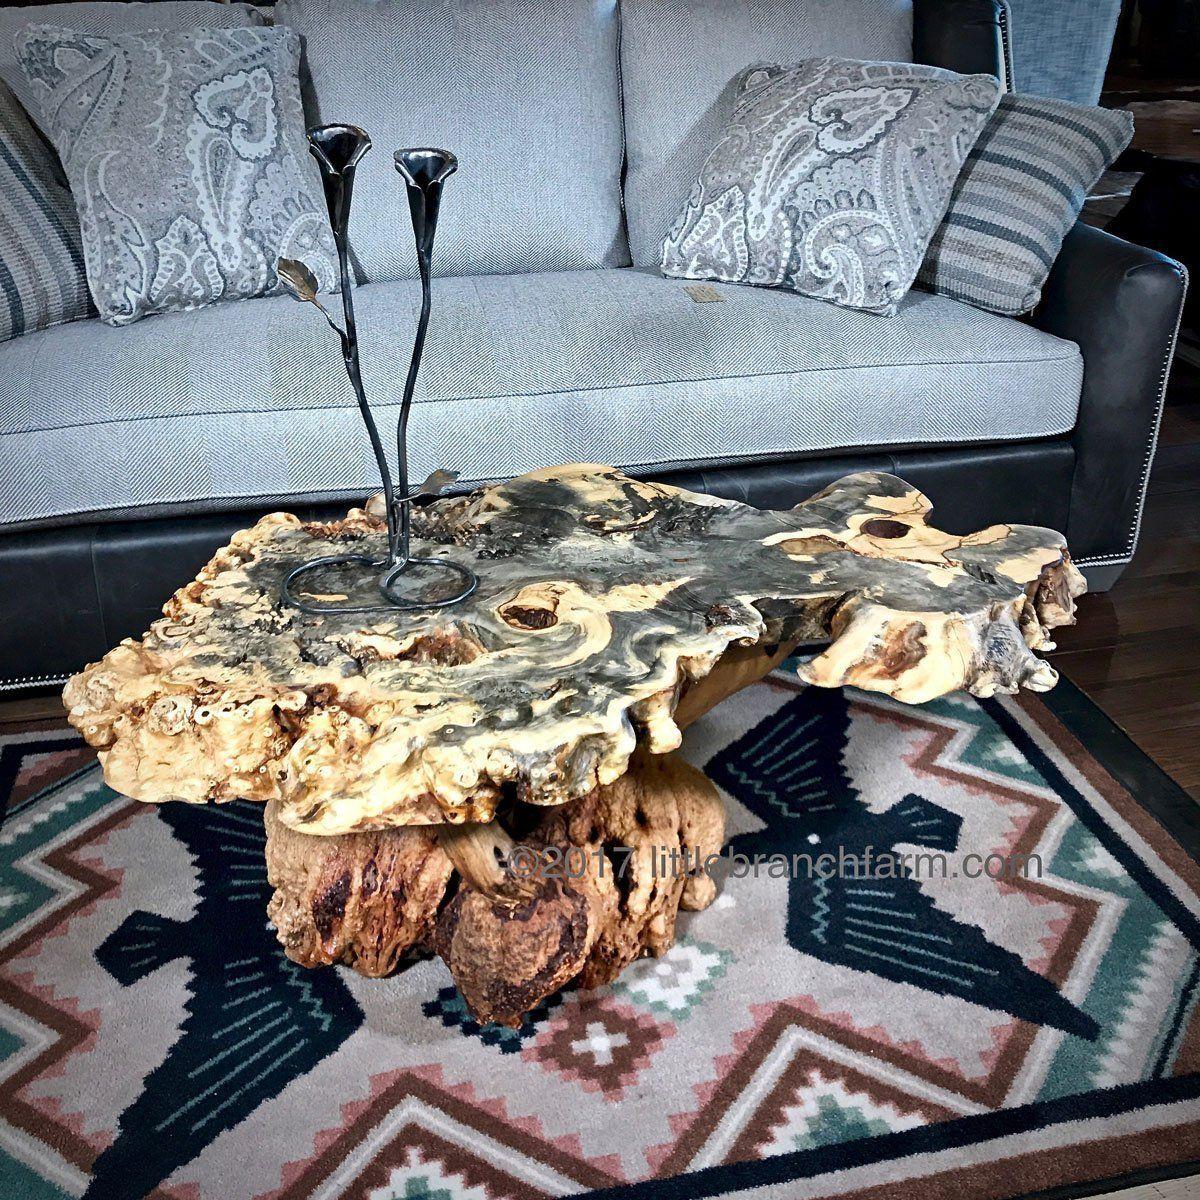 Burl wood coffee table live edge table littlebranch